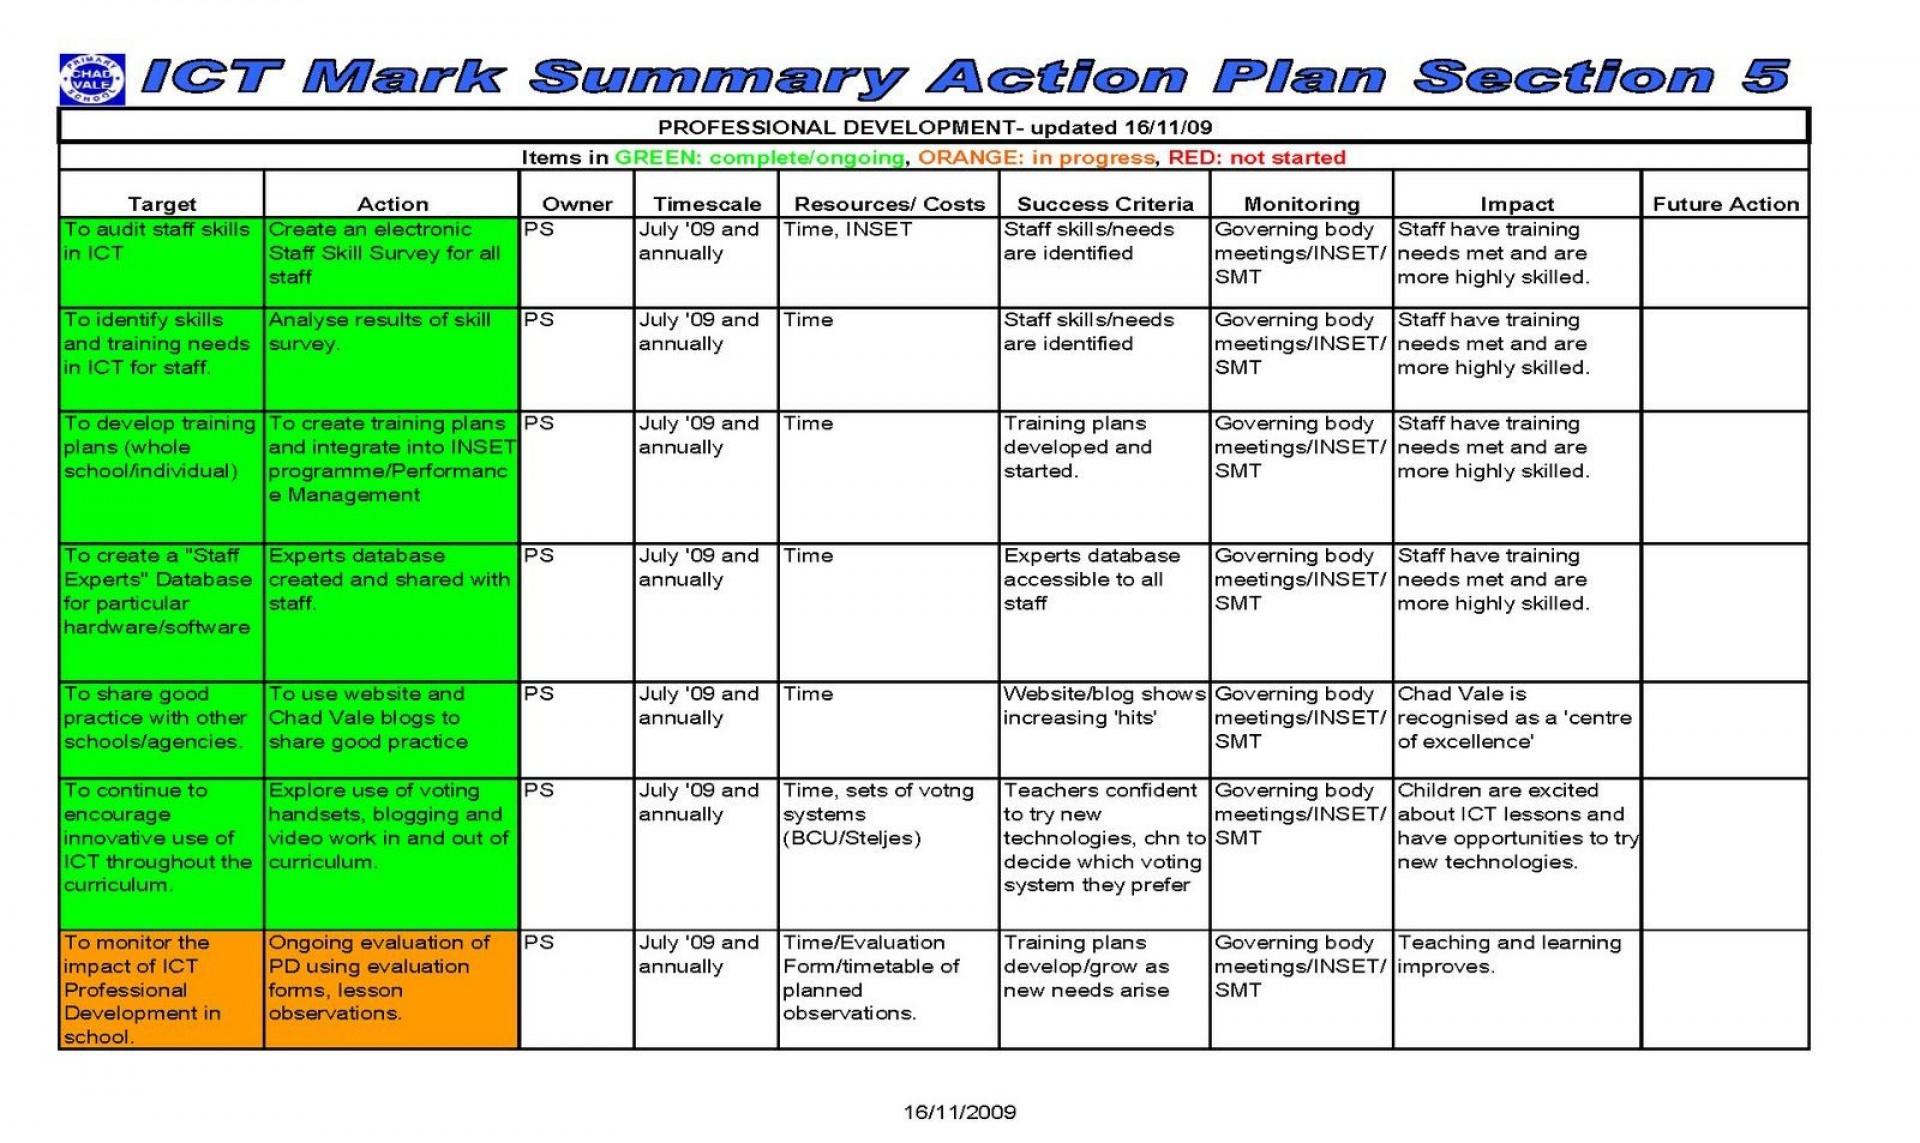 004 Wondrou Professional Development Plan Template For Employee High Definition  Example Sample1920